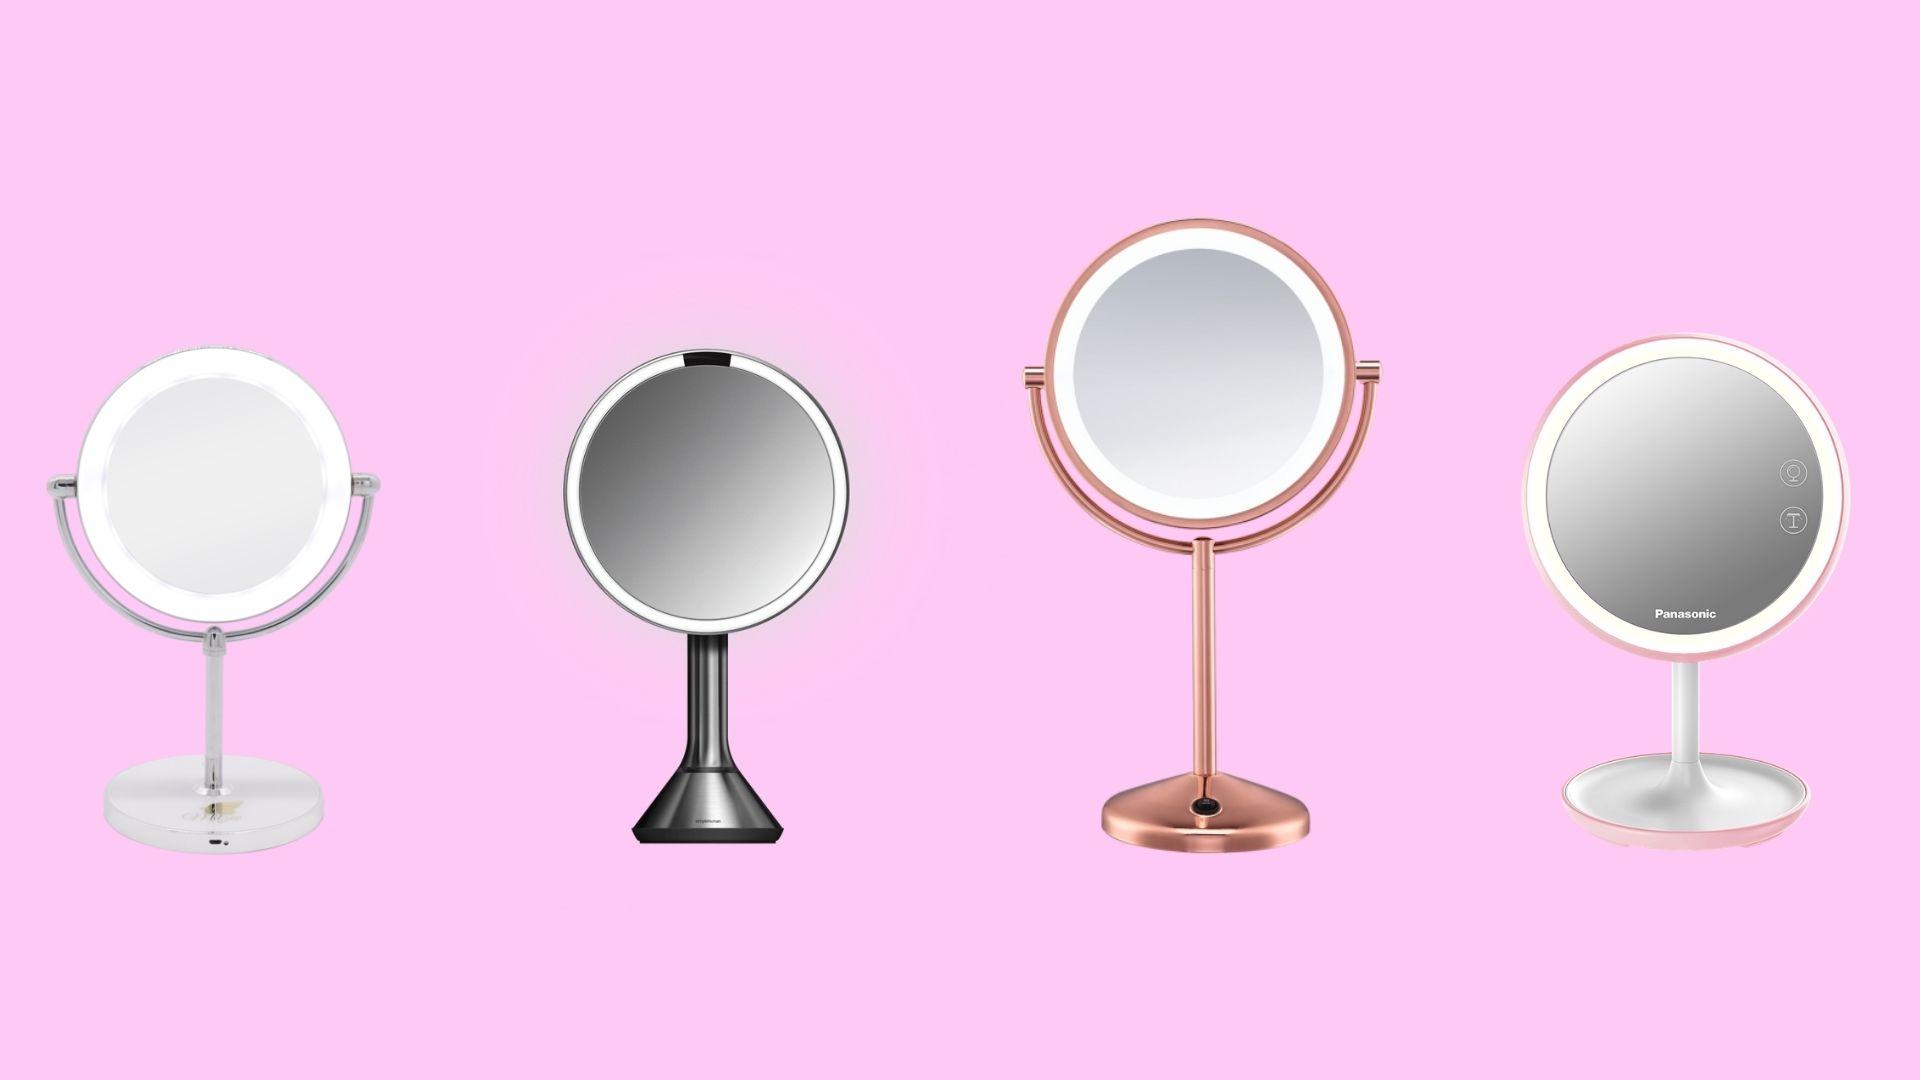 miglior-specchio-ingranditore